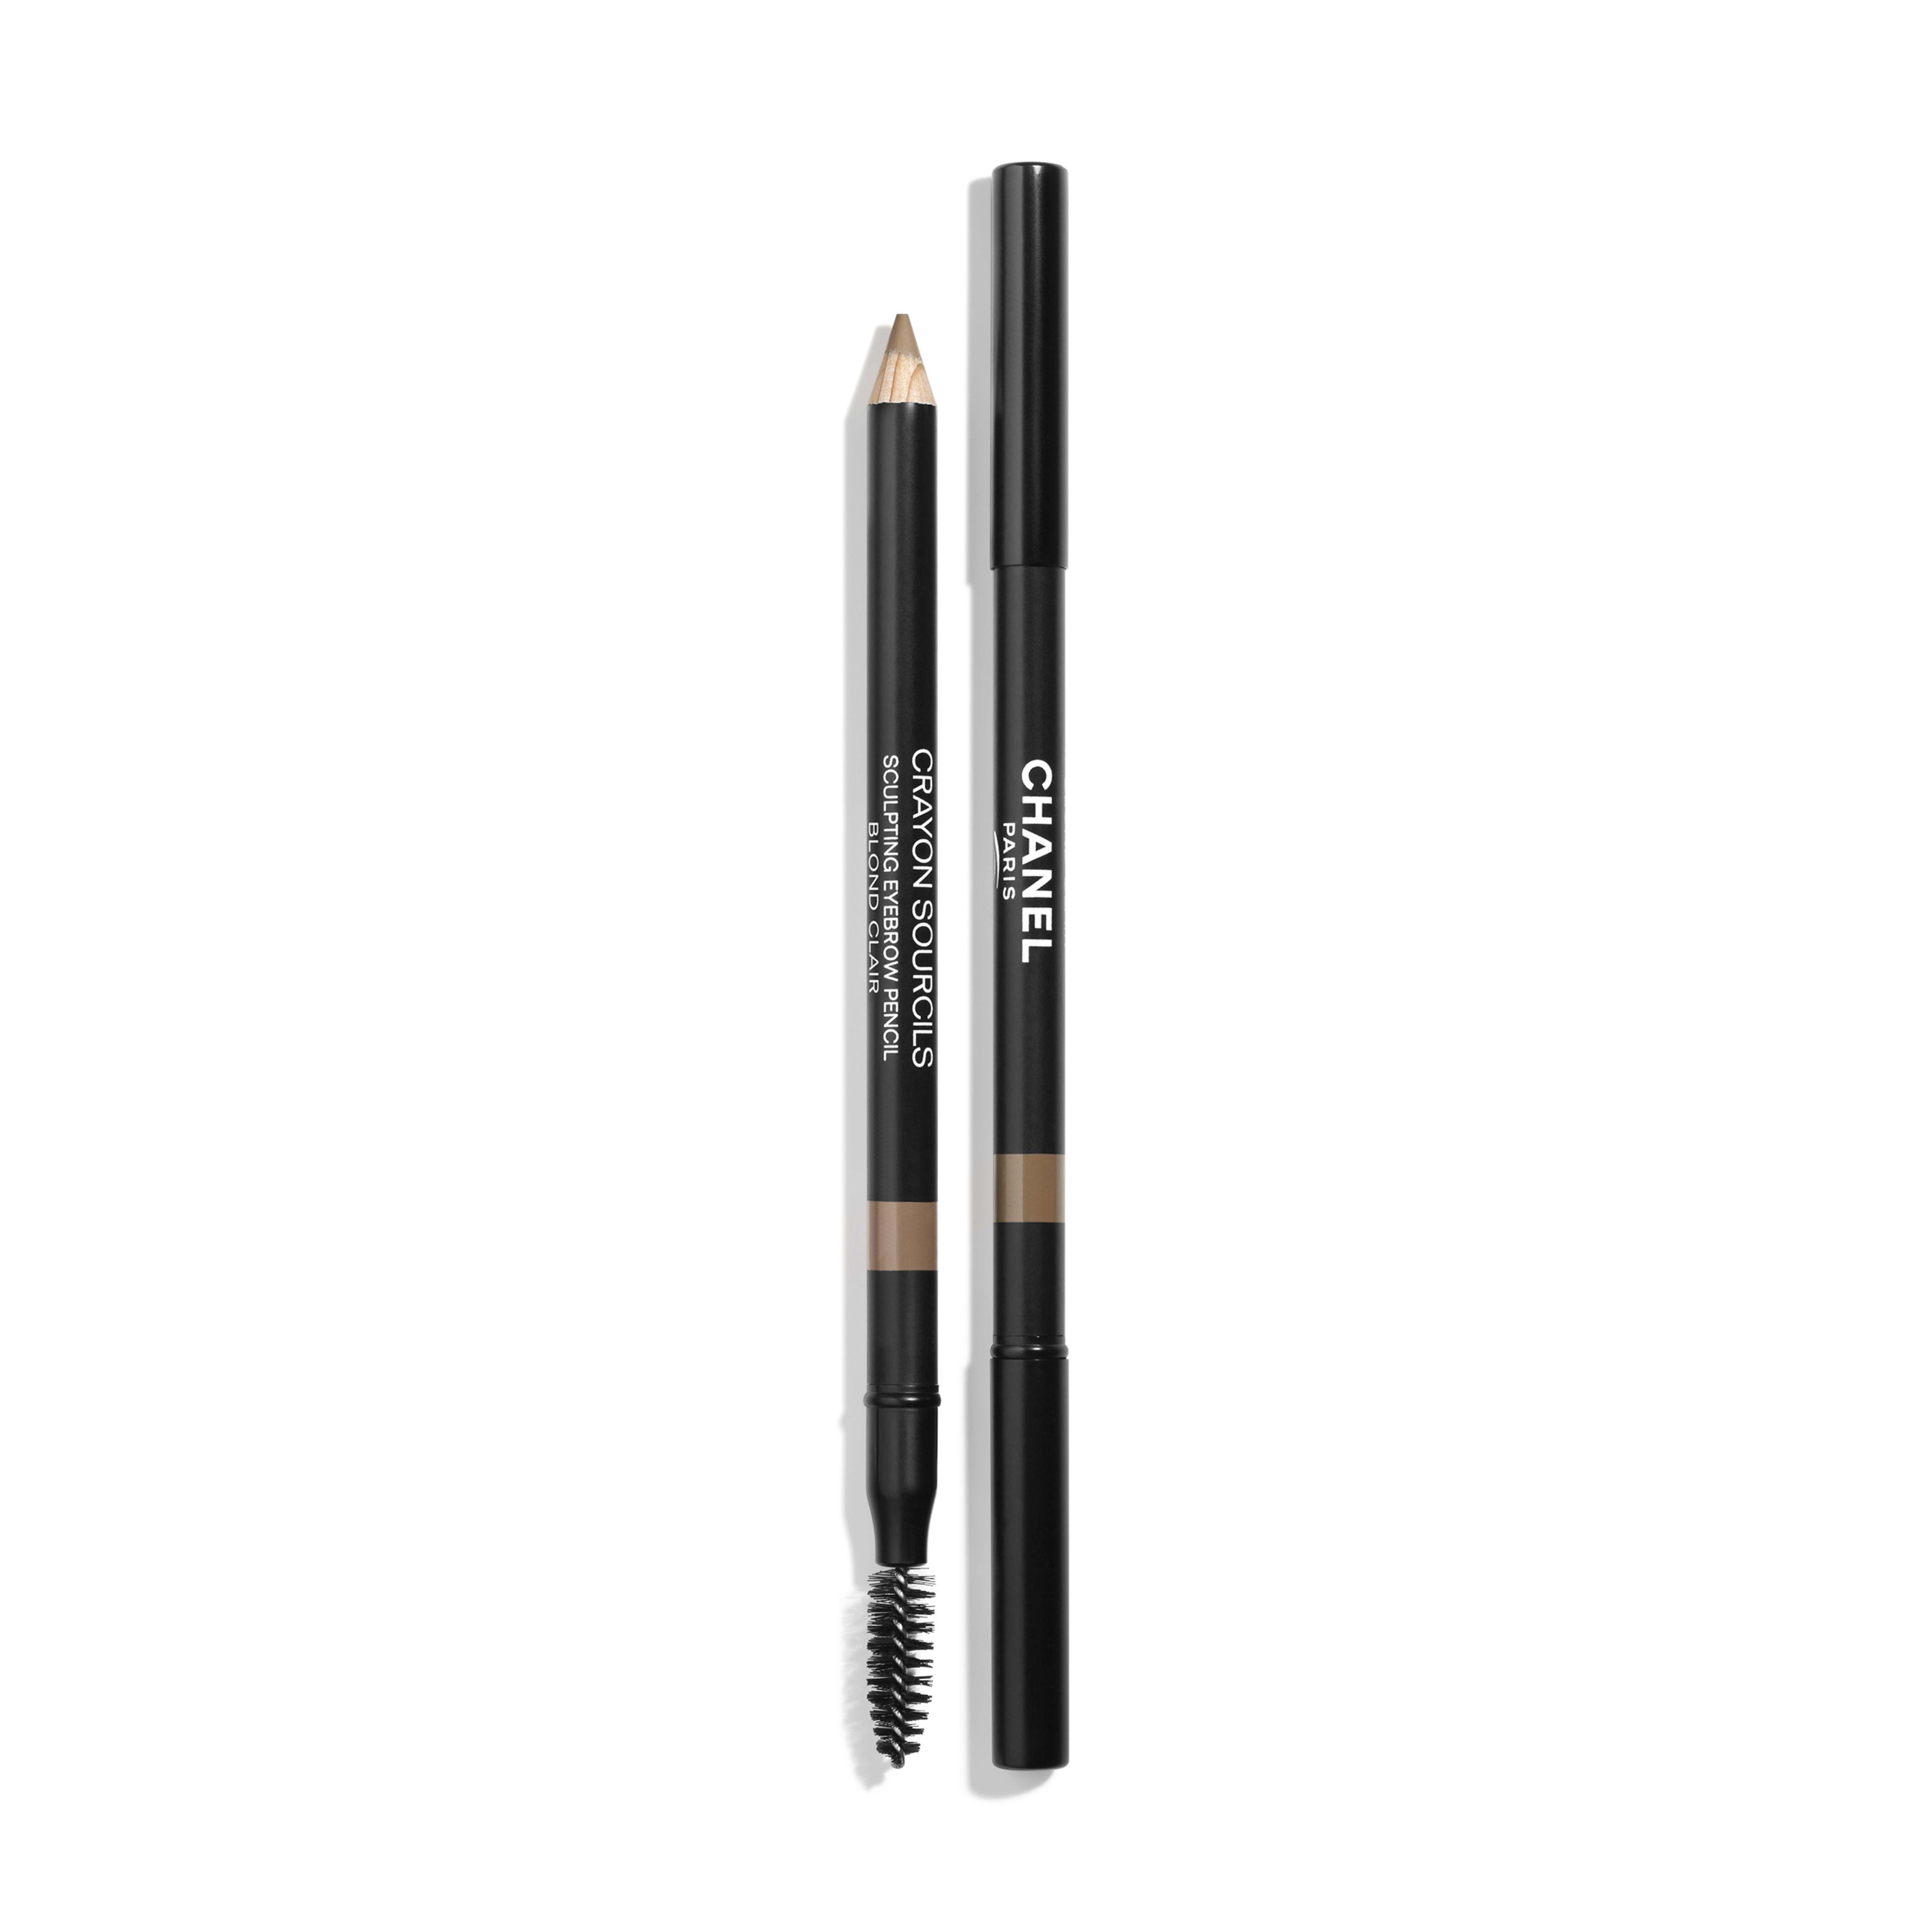 CRAYON SOURCILS - makeup - 1g - Default view